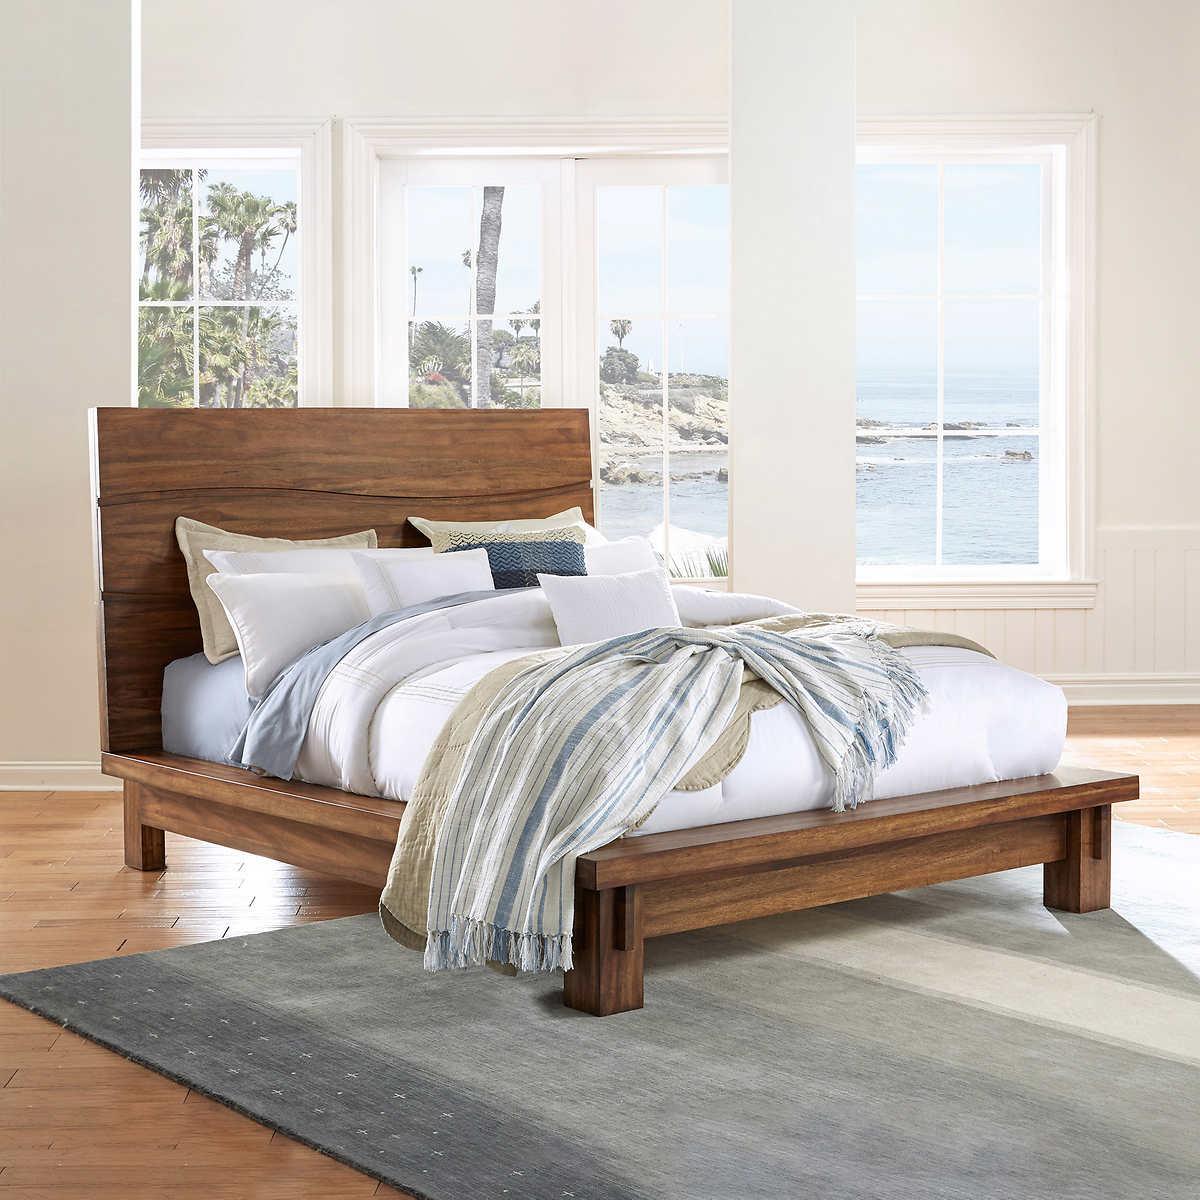 King bed frame wood - Rivina Cal King Bed